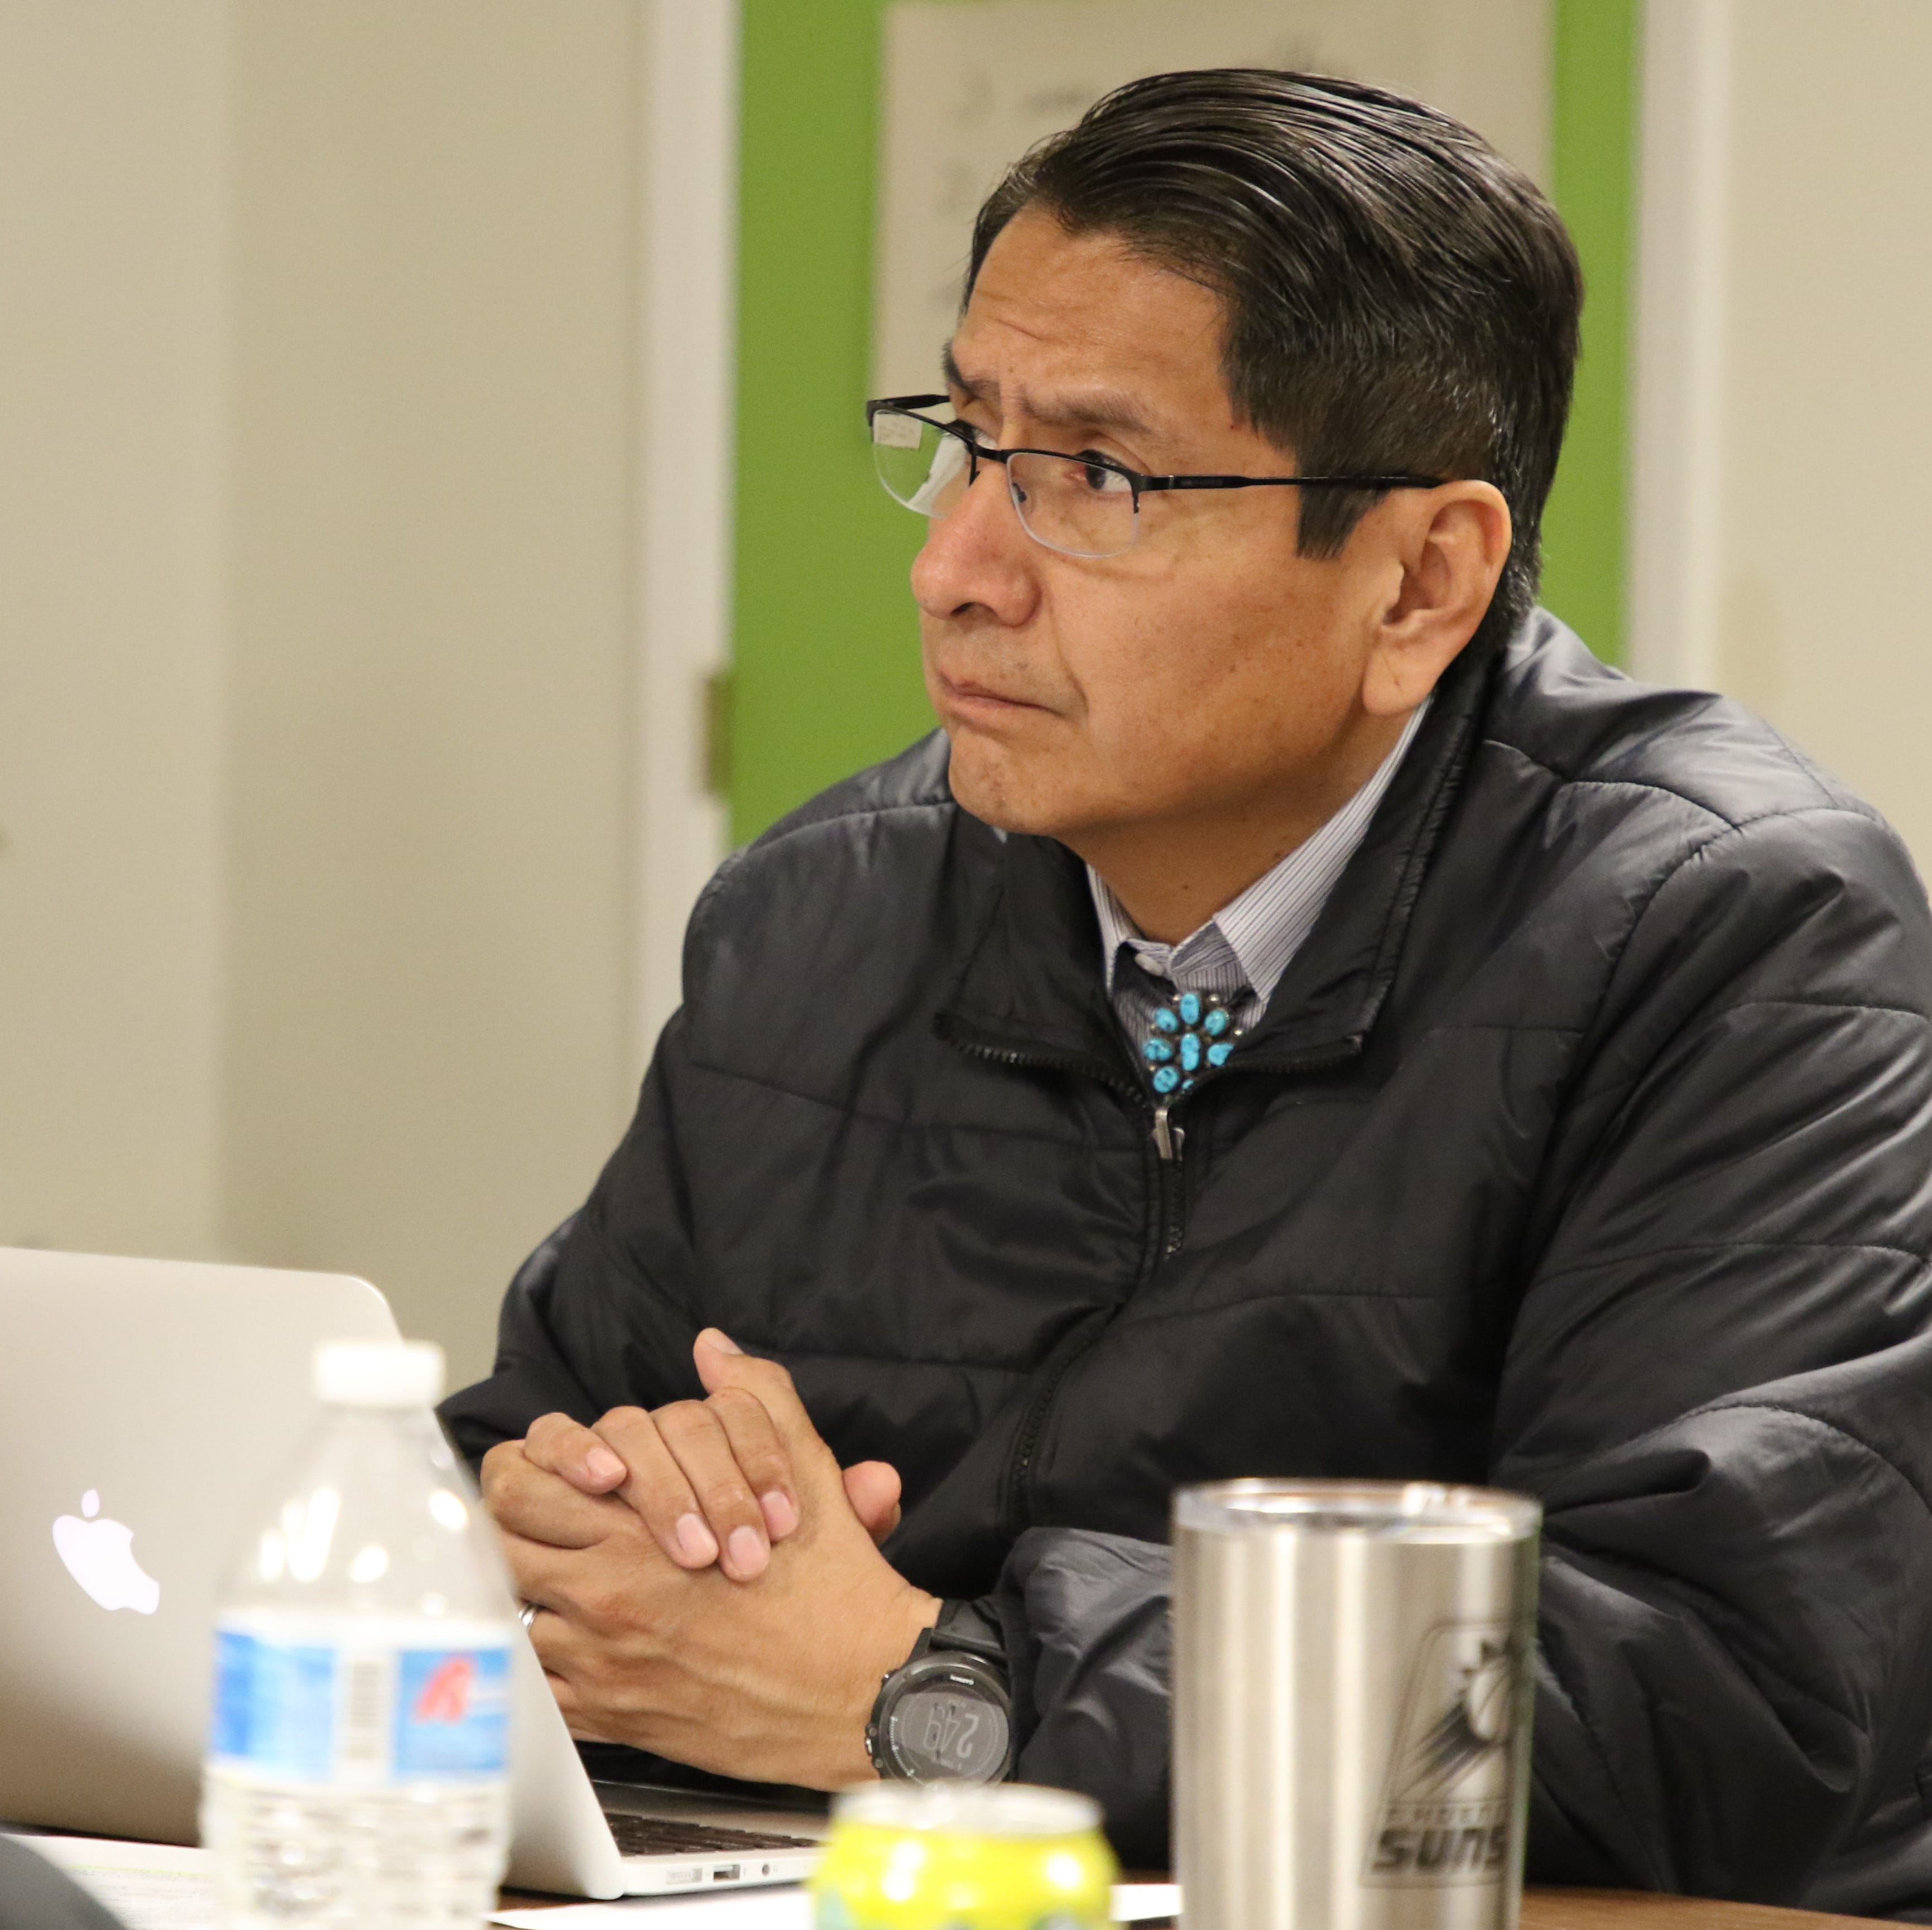 Nez, Lizer prepare for the Navajo Nation inauguration